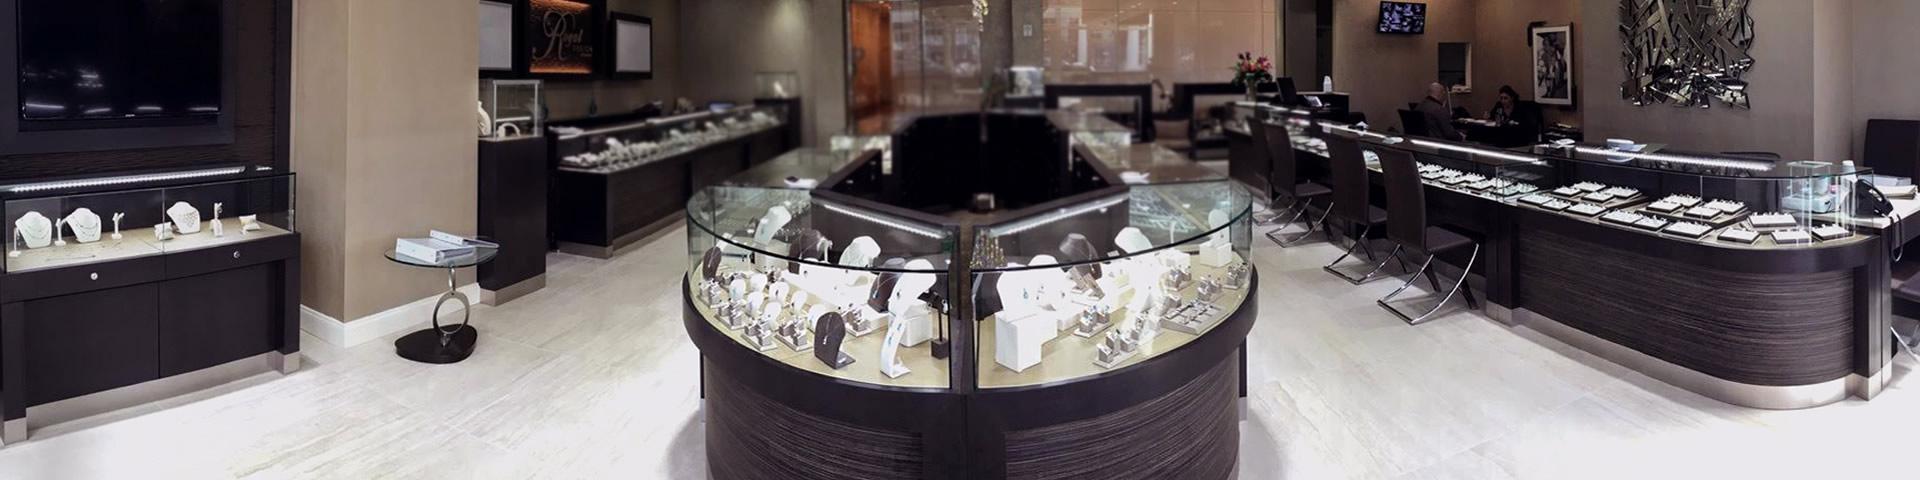 Jewelry Store in Atlanta | Royal Design Fine Jewelry